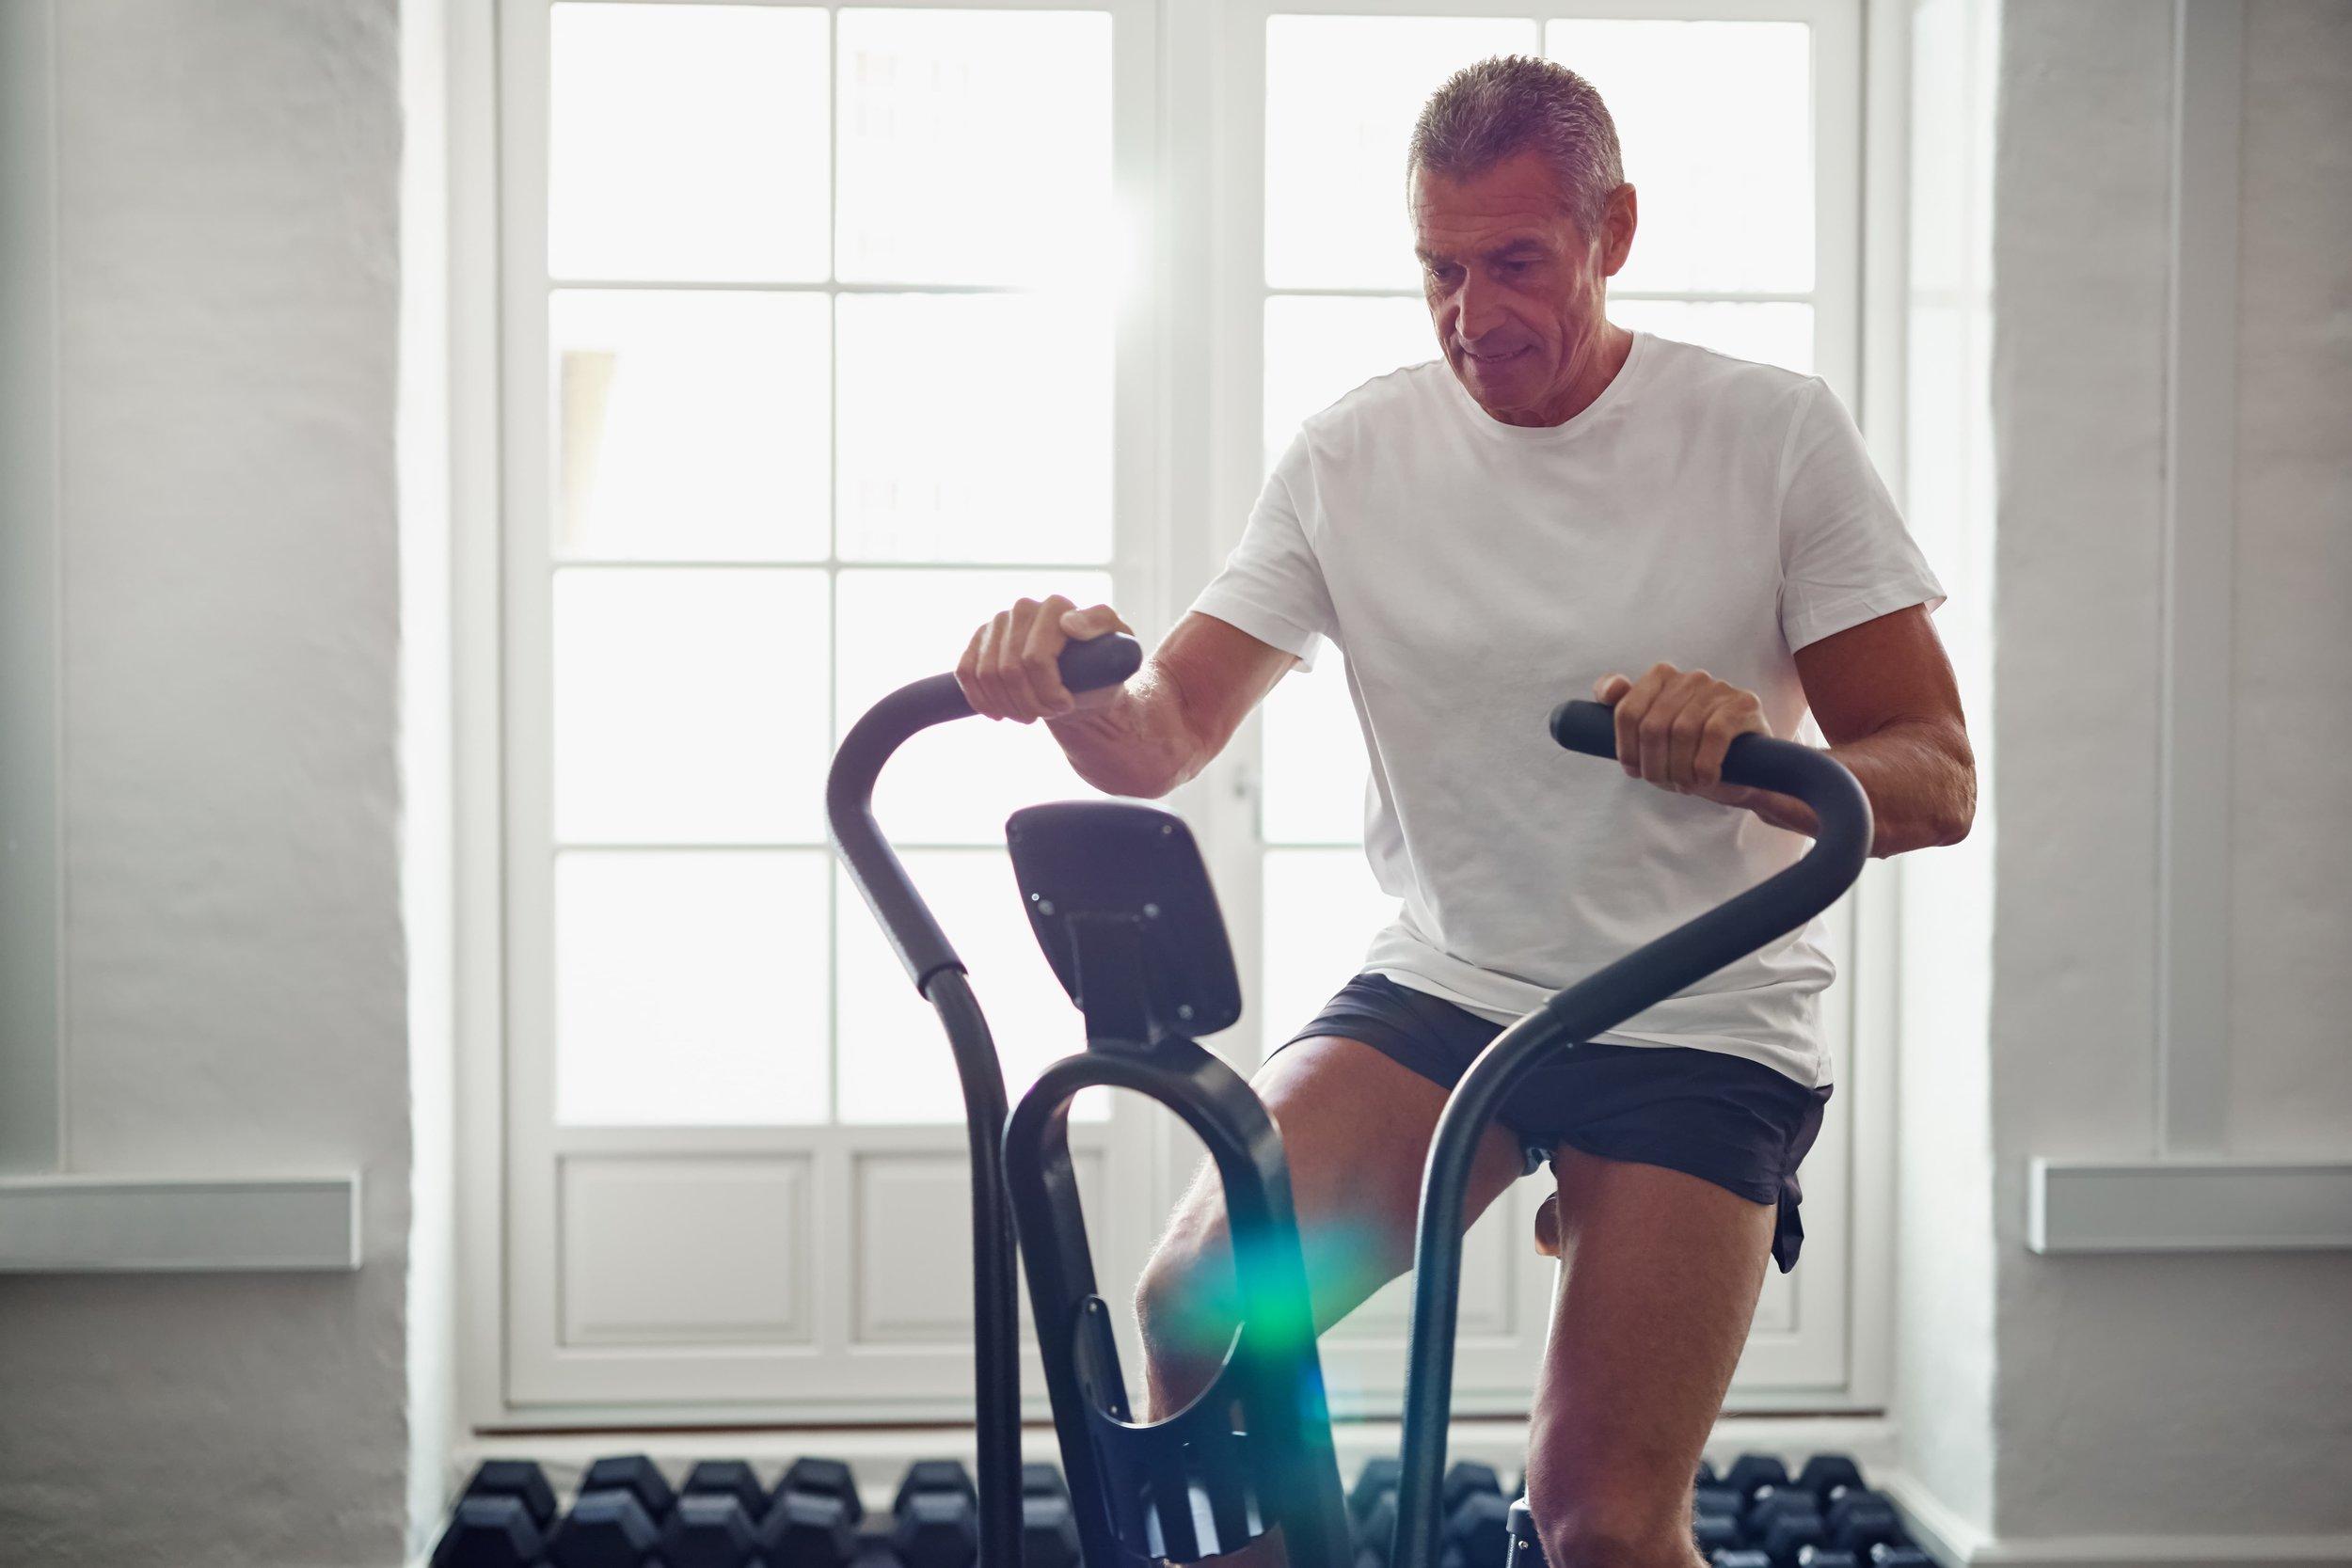 man-exercising-on-cycling-machine